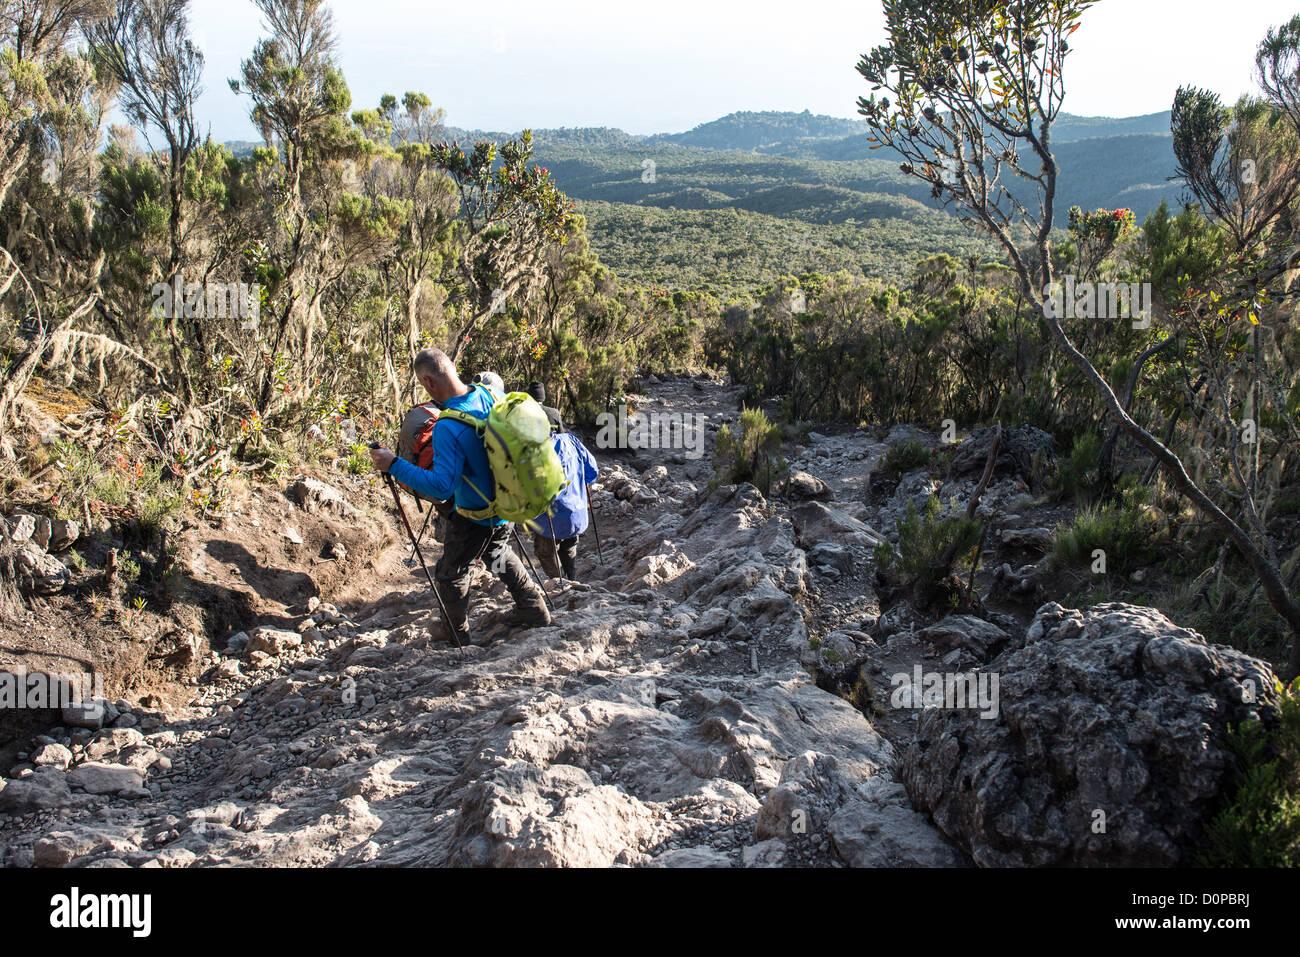 MT KILIMANJARO, Tanzania - Climbers descend down at rocky and steep section of Mweka Trail on Mt Kilimanjaro. - Stock Image